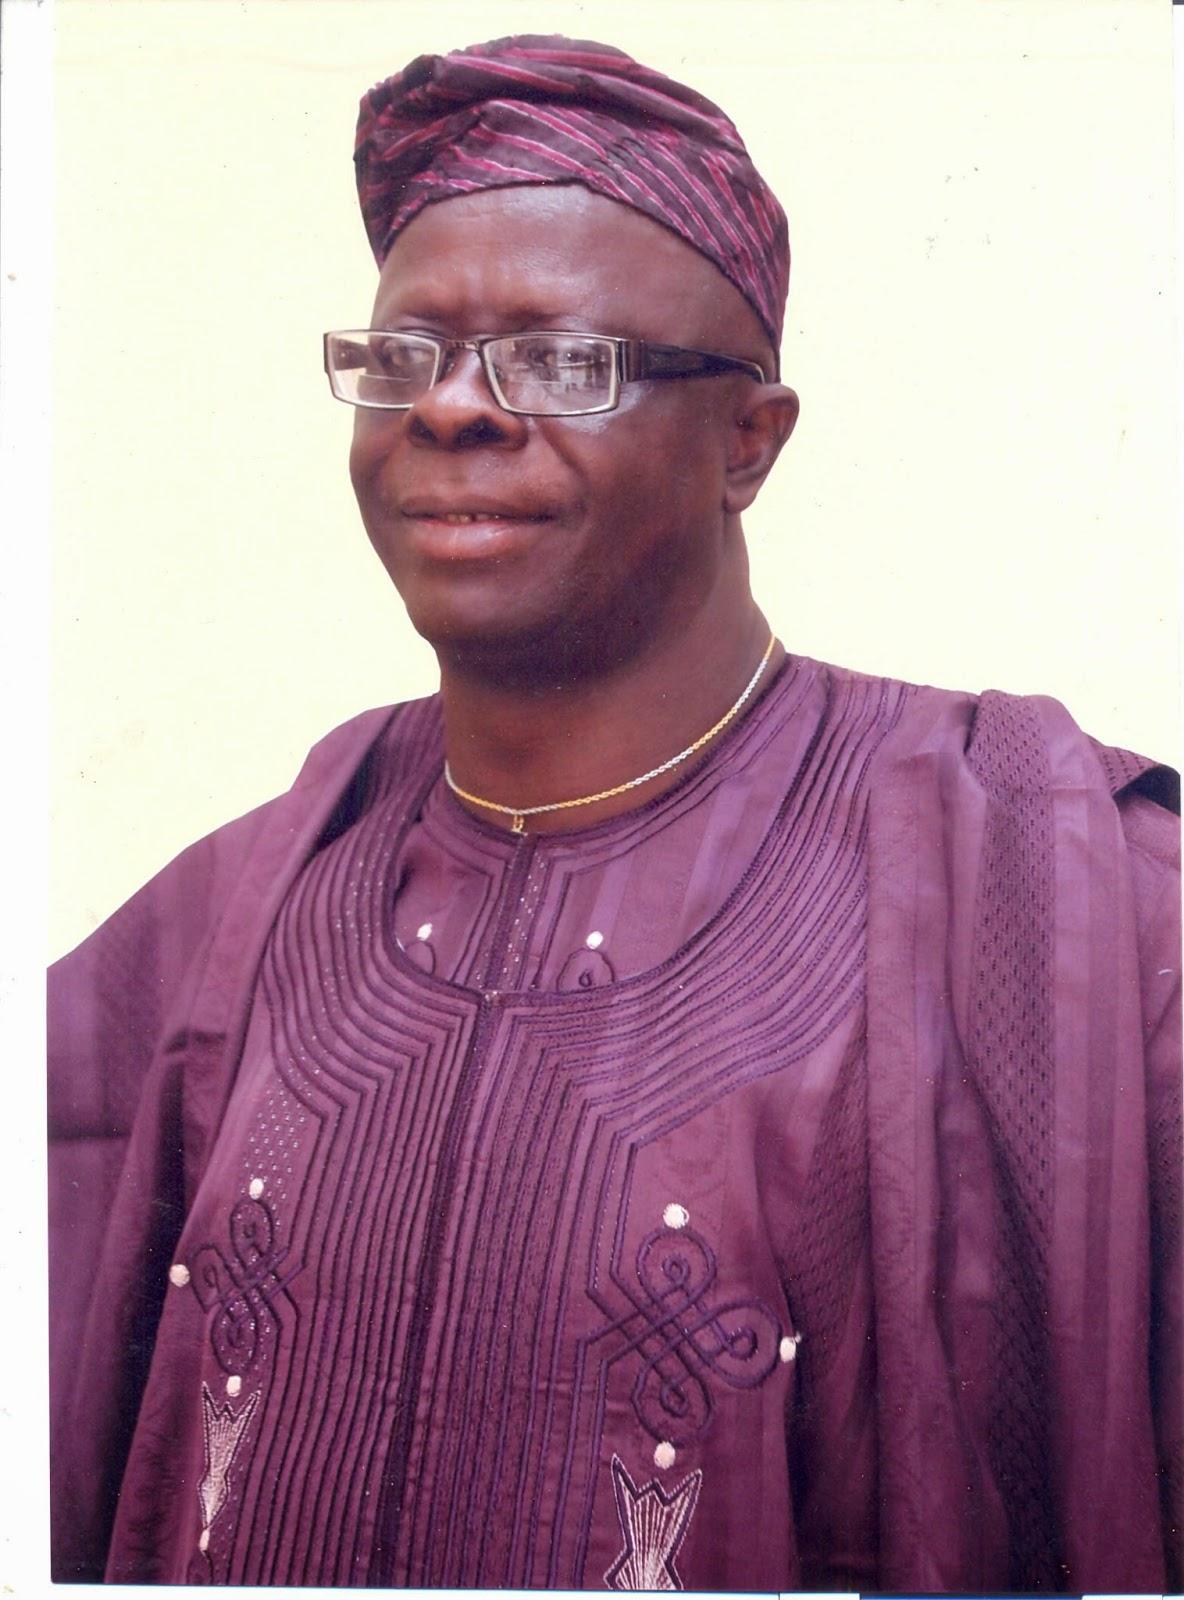 nigerian senators 15 kids